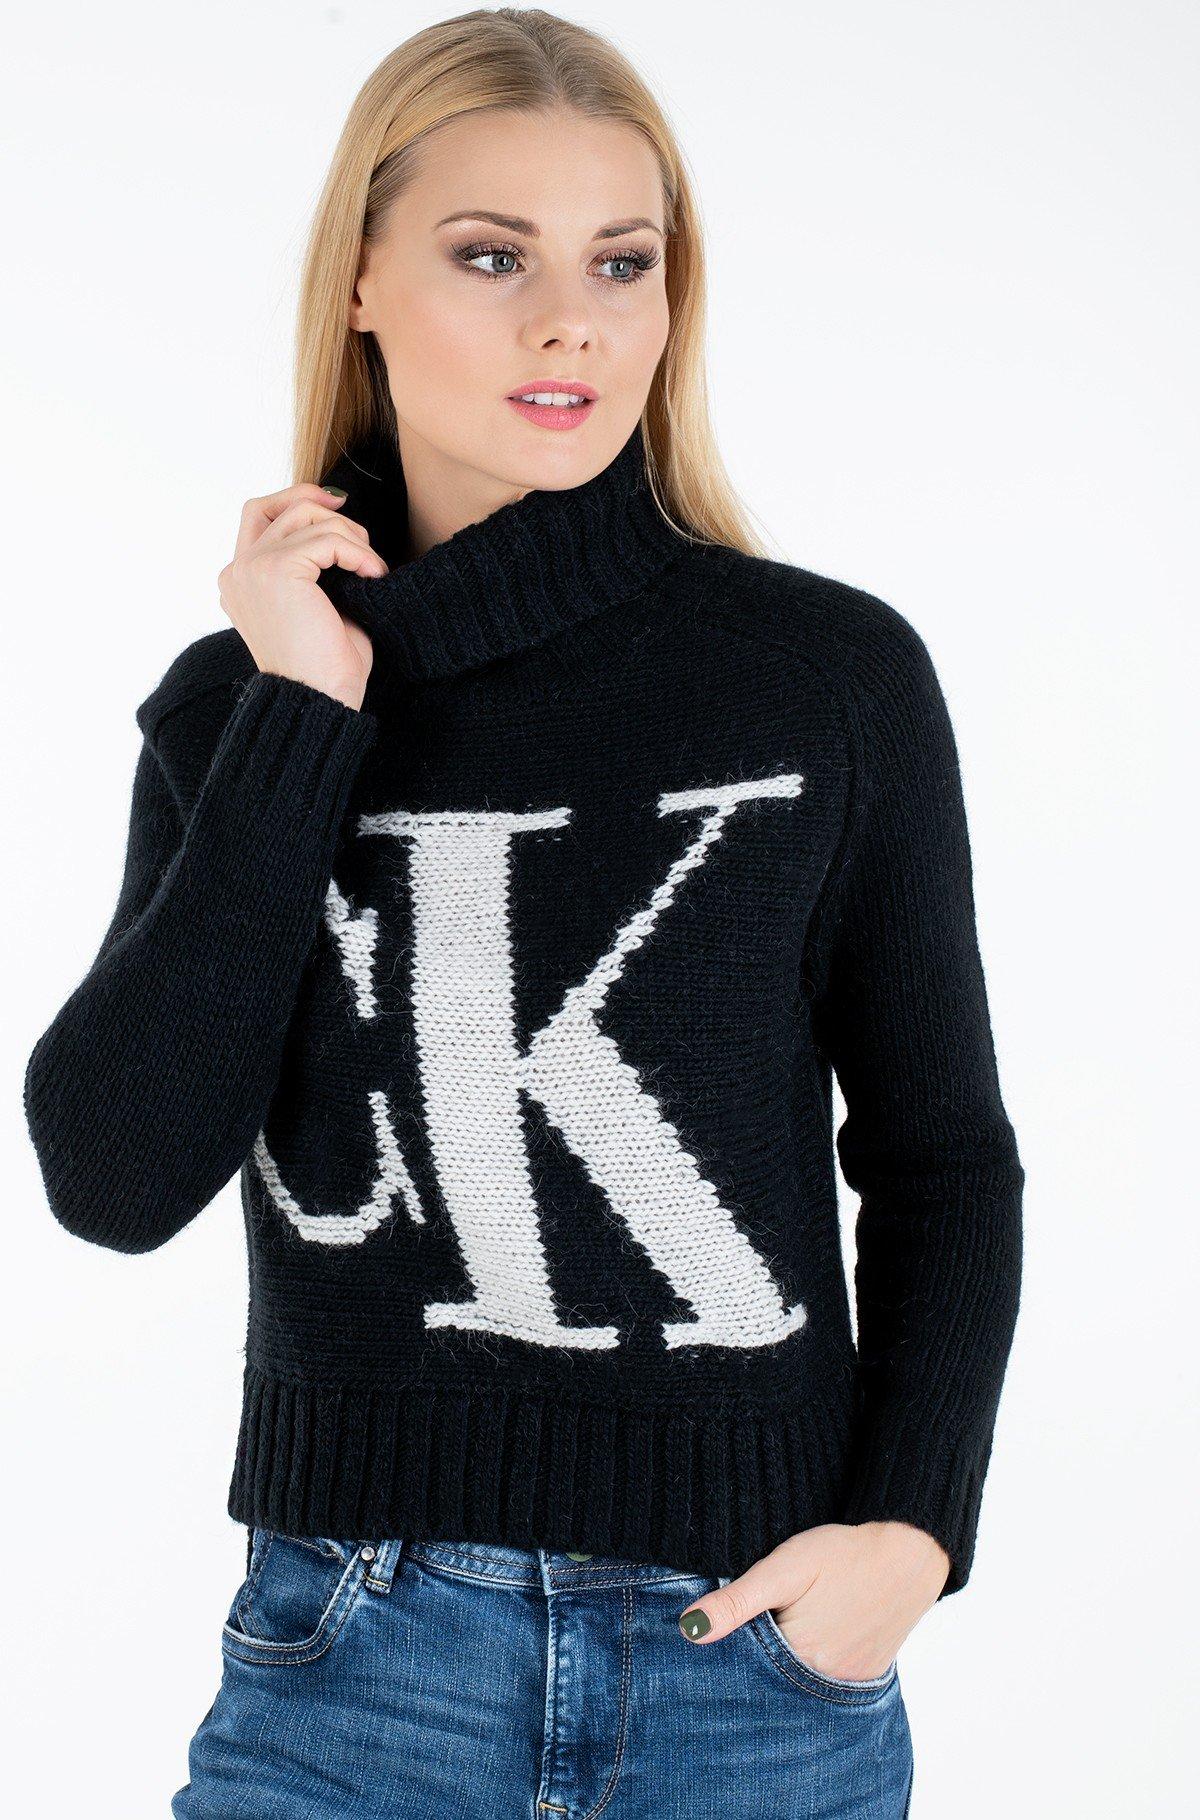 Kampsun CK LOGO ROLL NECK SWEATER-full-1